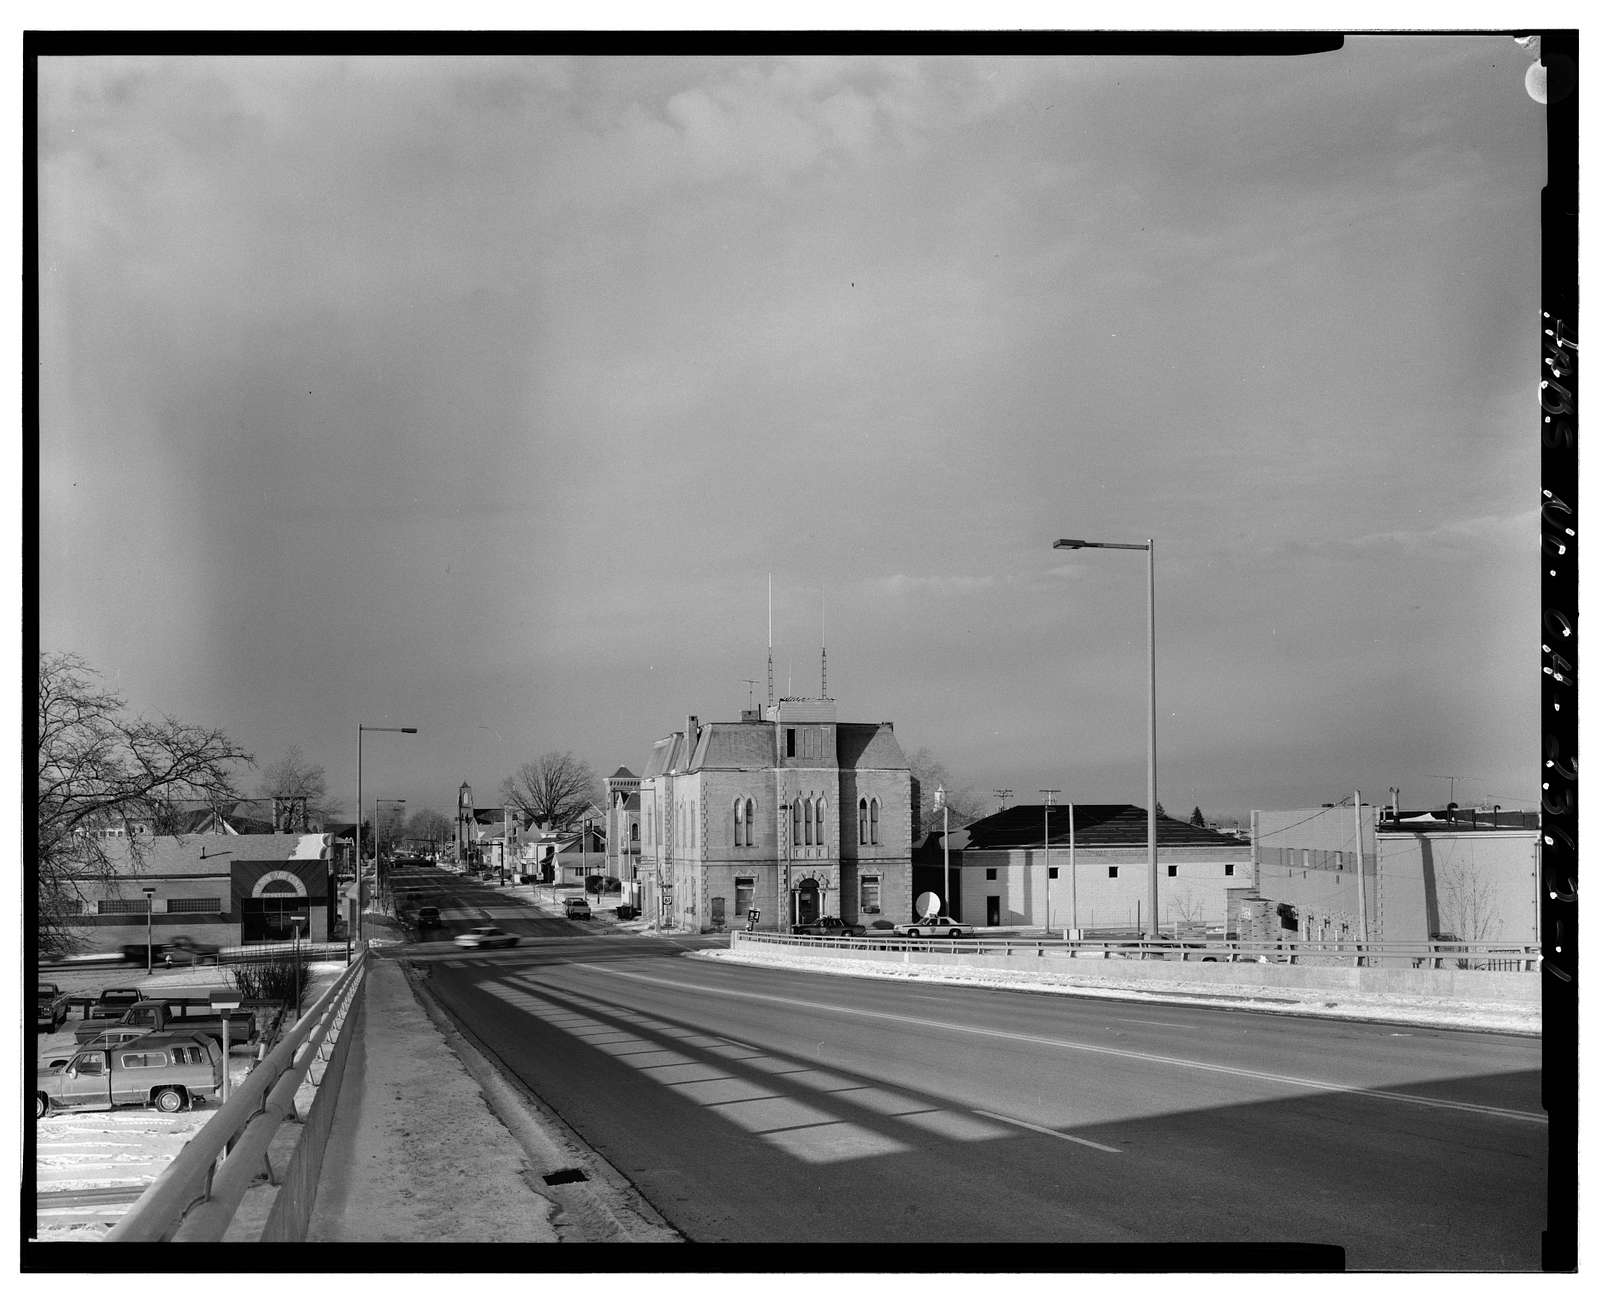 Crestline City Hall, Bucyrus & Thoman Streets, Crestline, Crawford County, OH